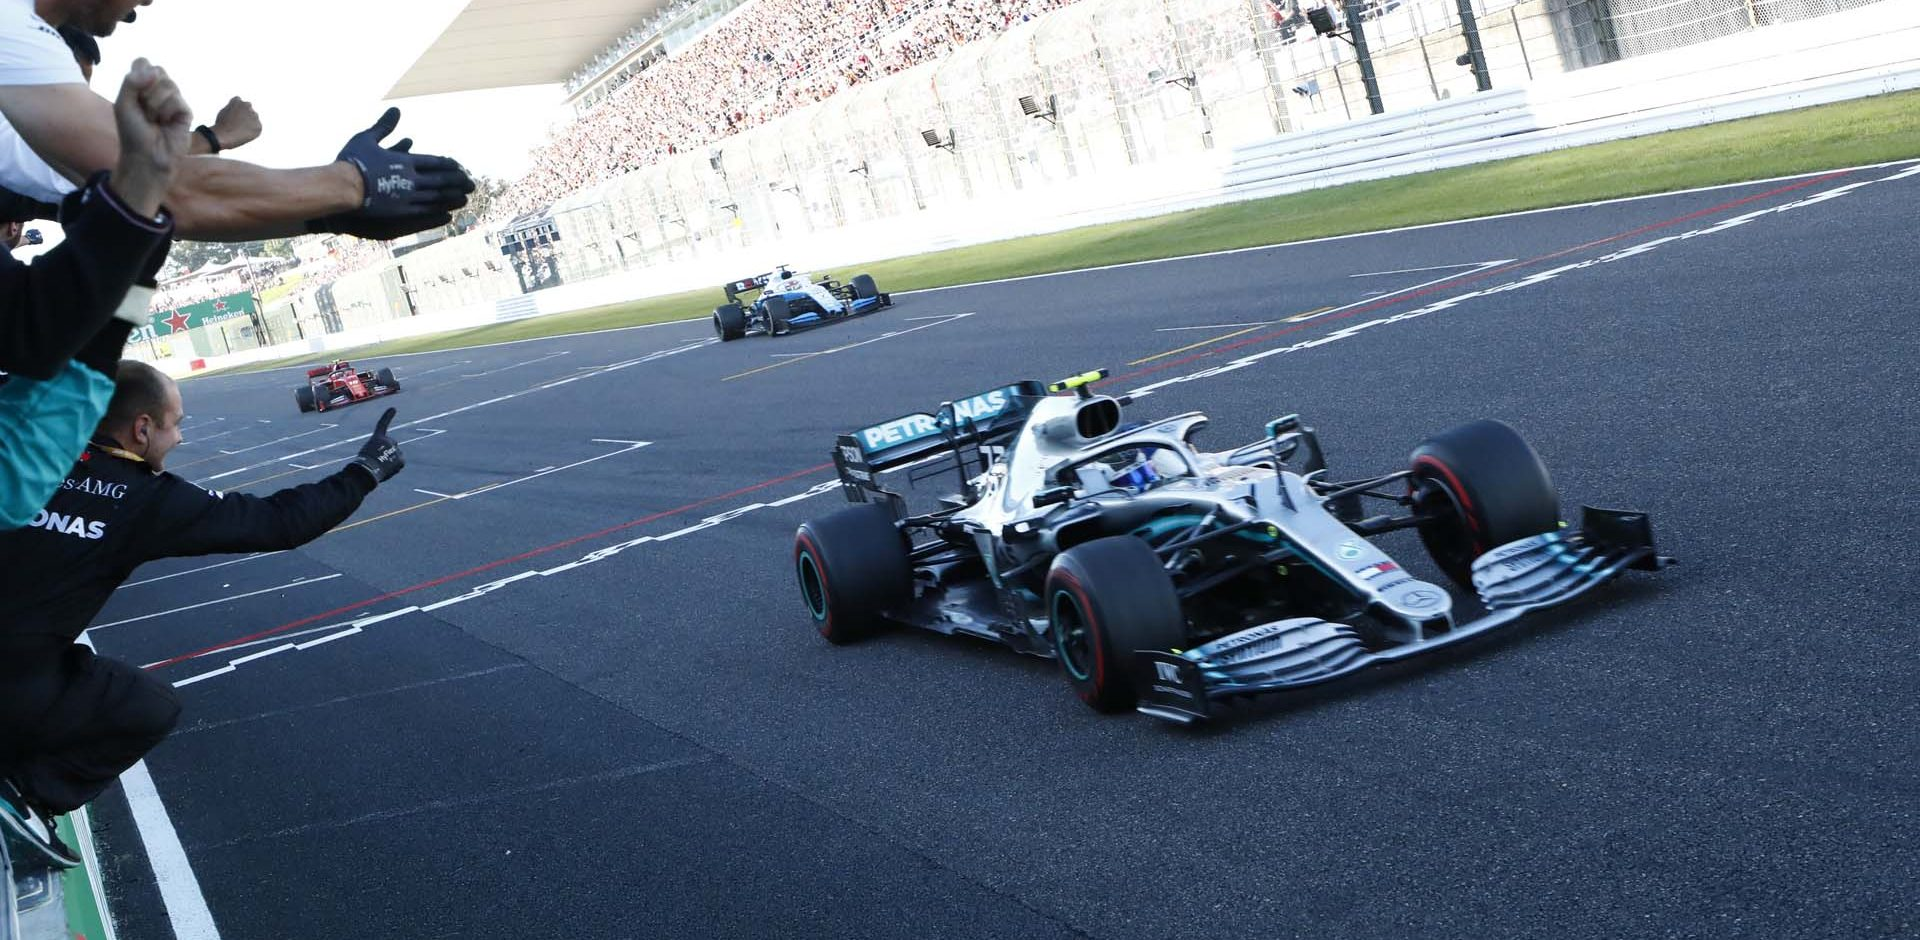 2019 Japanese Grand Prix, Sunday - Wolfgang Wilhelm Valtteri Bottas Mercedes wins